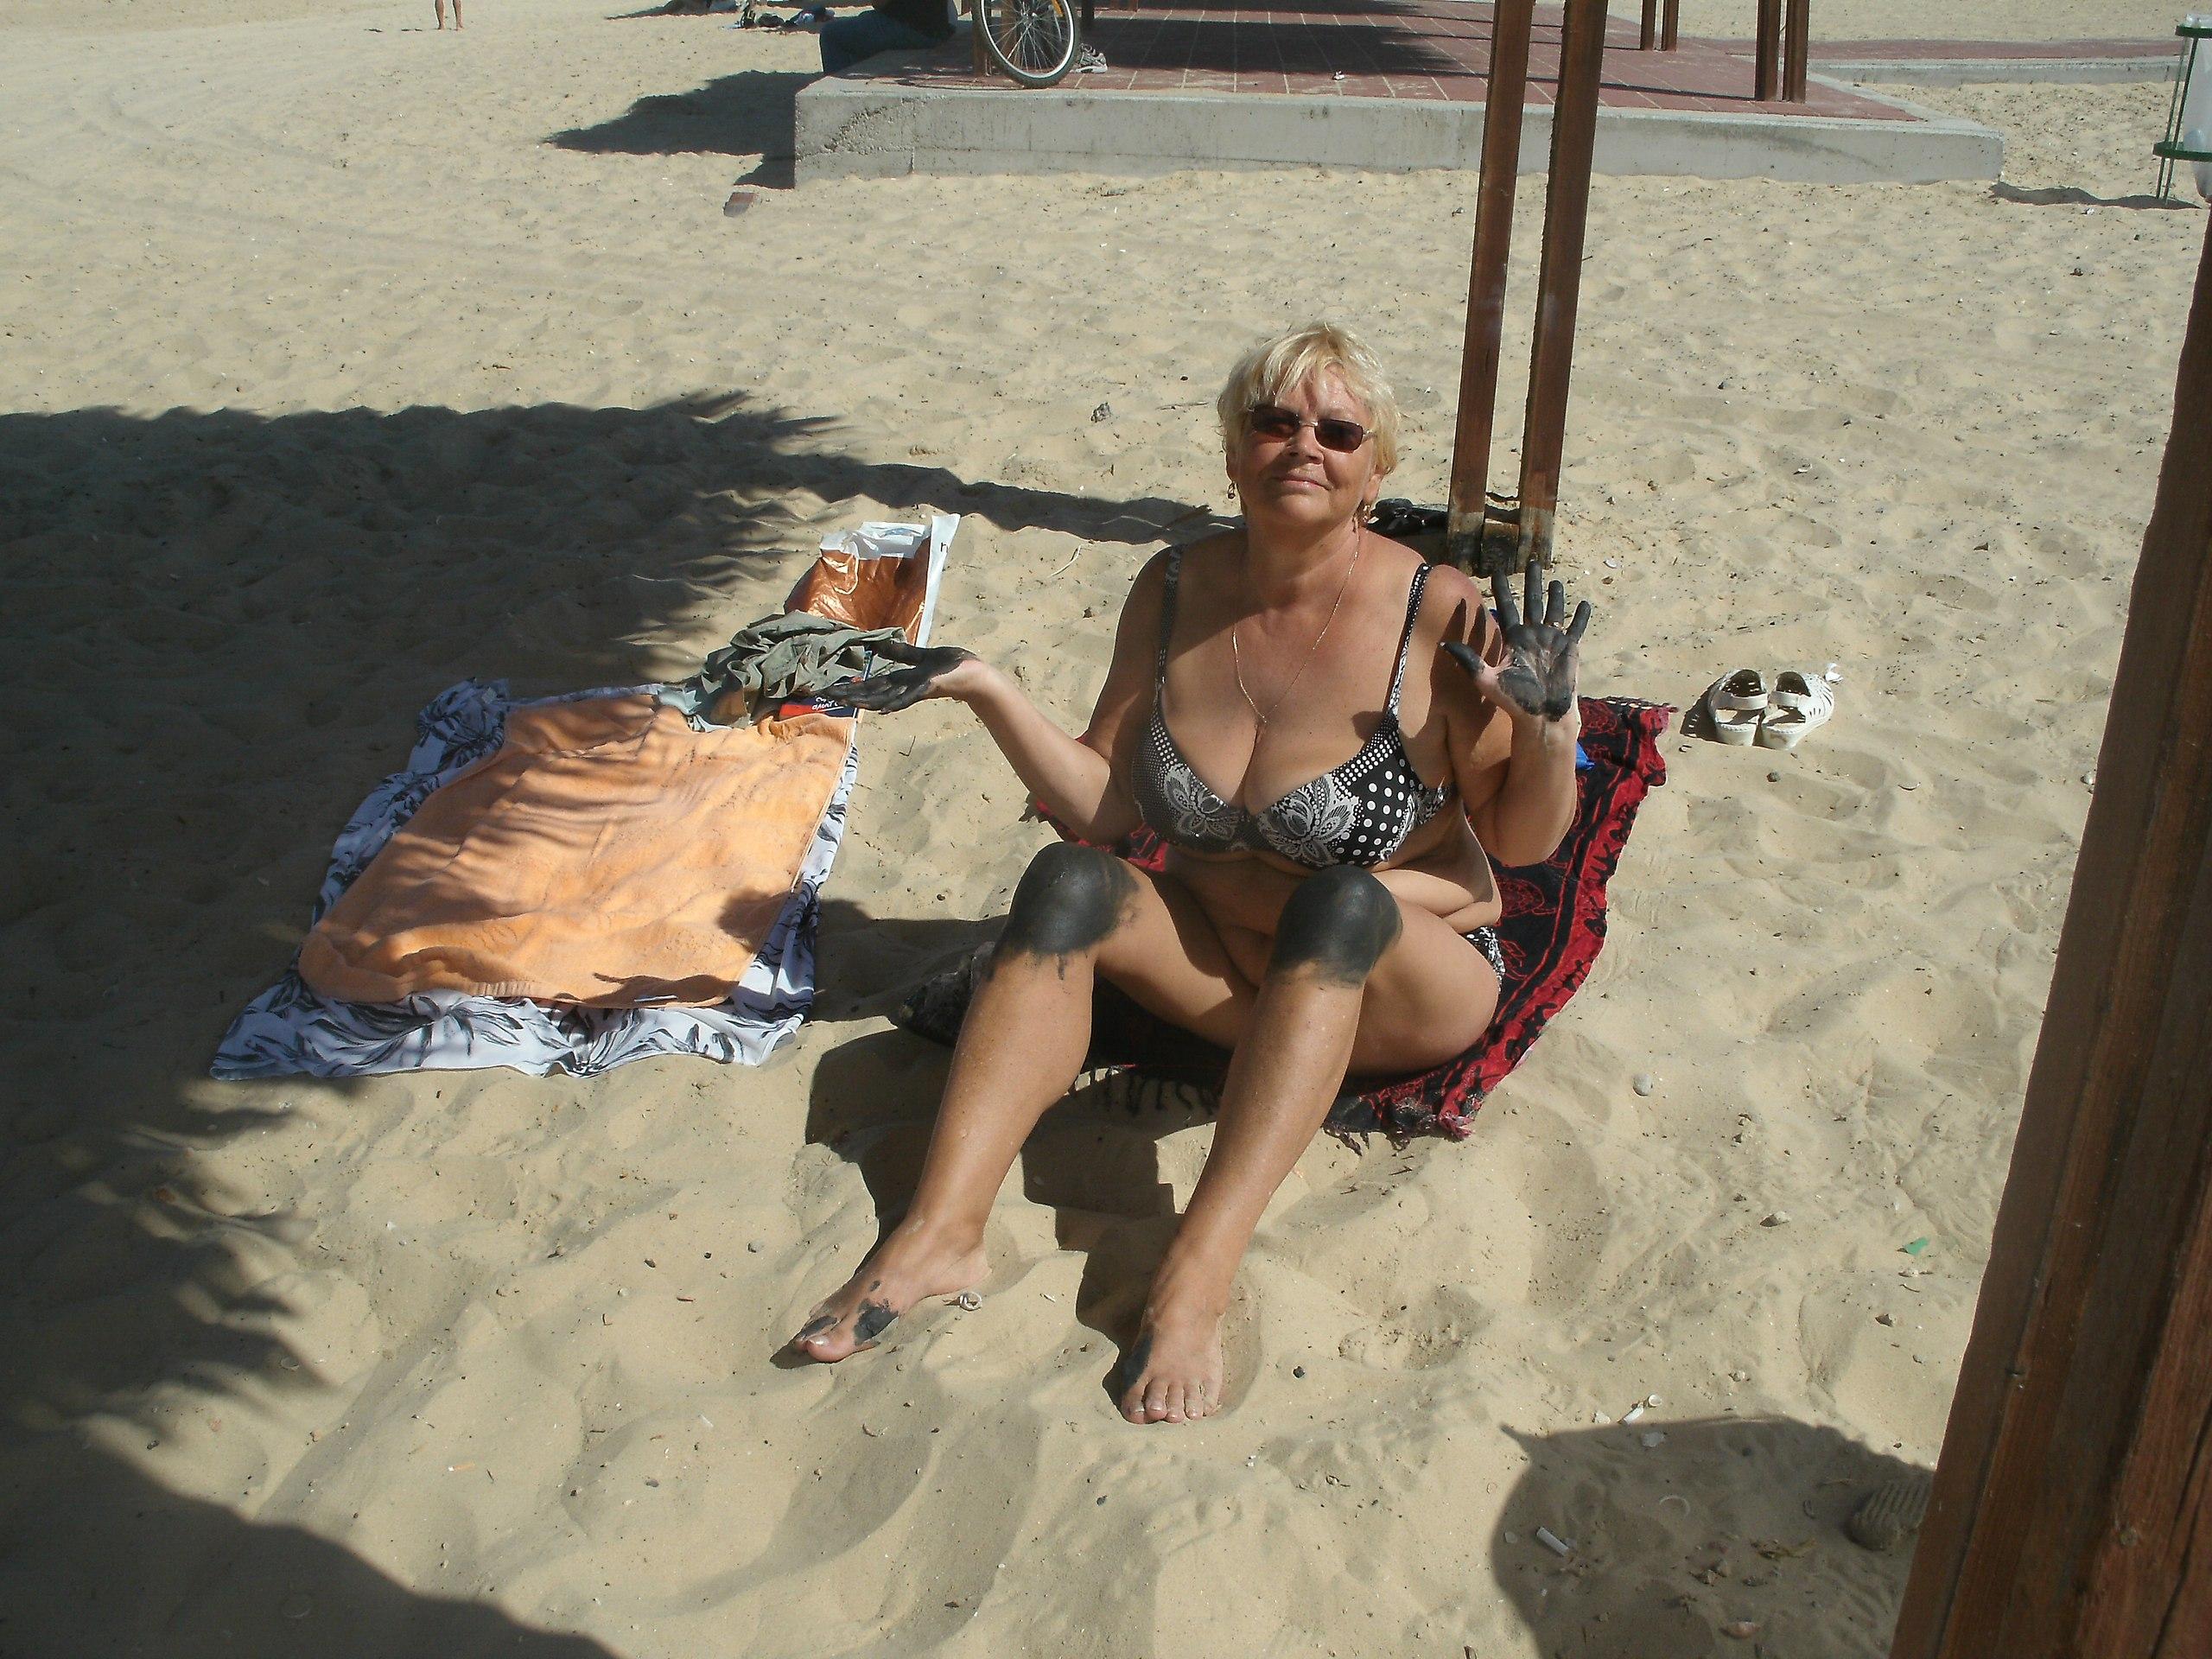 Фото женщин за 50 (22 фото) - Антонина-, Казань